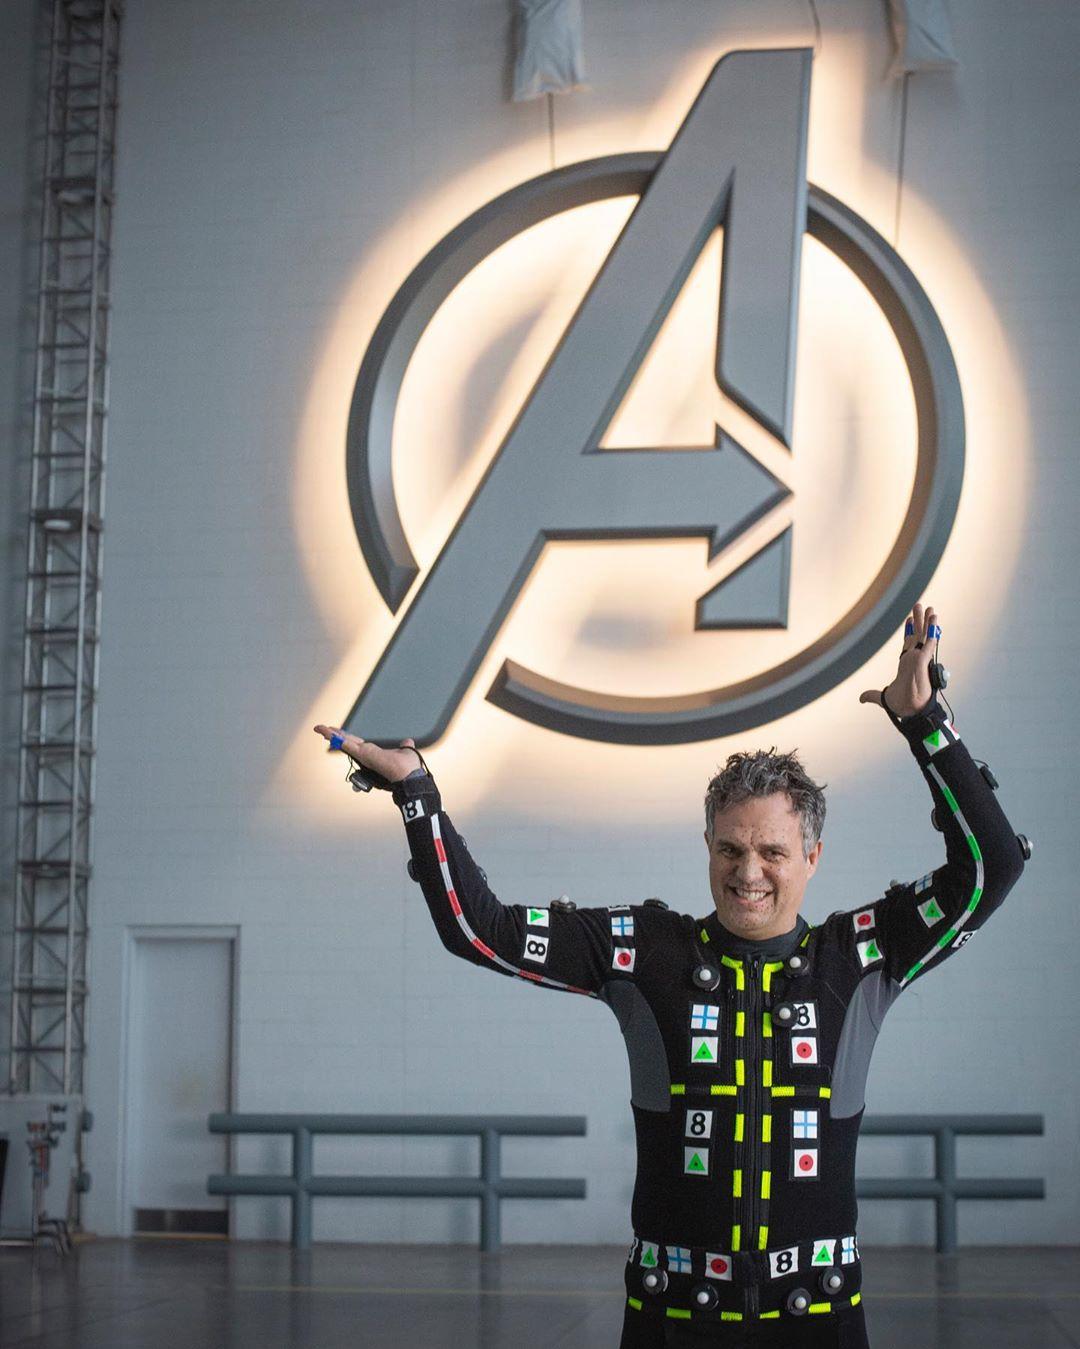 Mark Ruffalo como el Dr. Bruce Banner/Hulk en el set de Avengers: Endgame (2019). Imagen: Disney+ Instagram (@disneyplus).